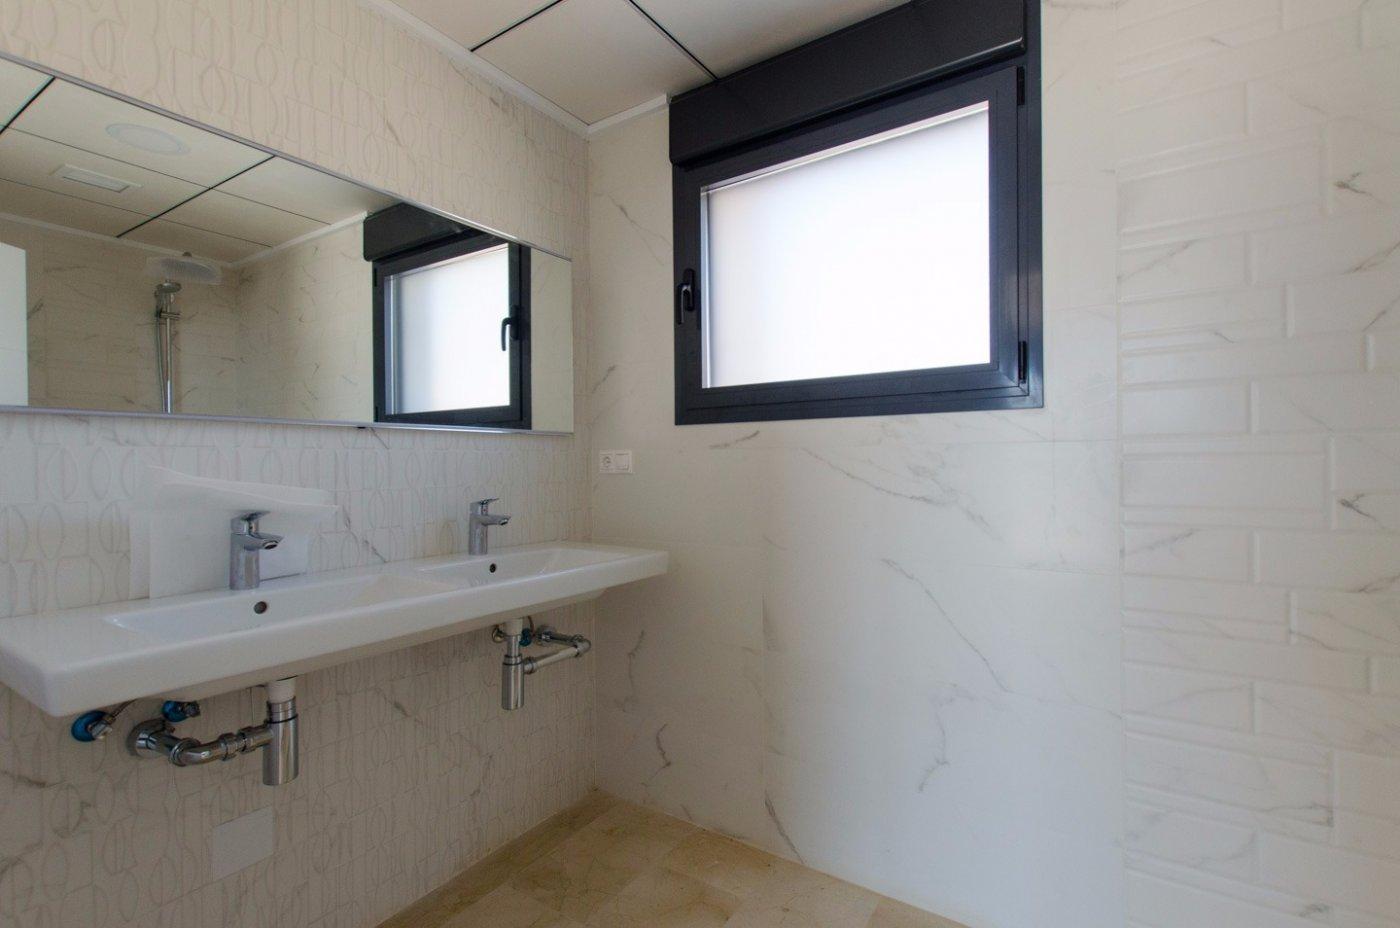 Villas modernas en balcÓn de finestrat a un paso de benidorm!!! - imagenInmueble30